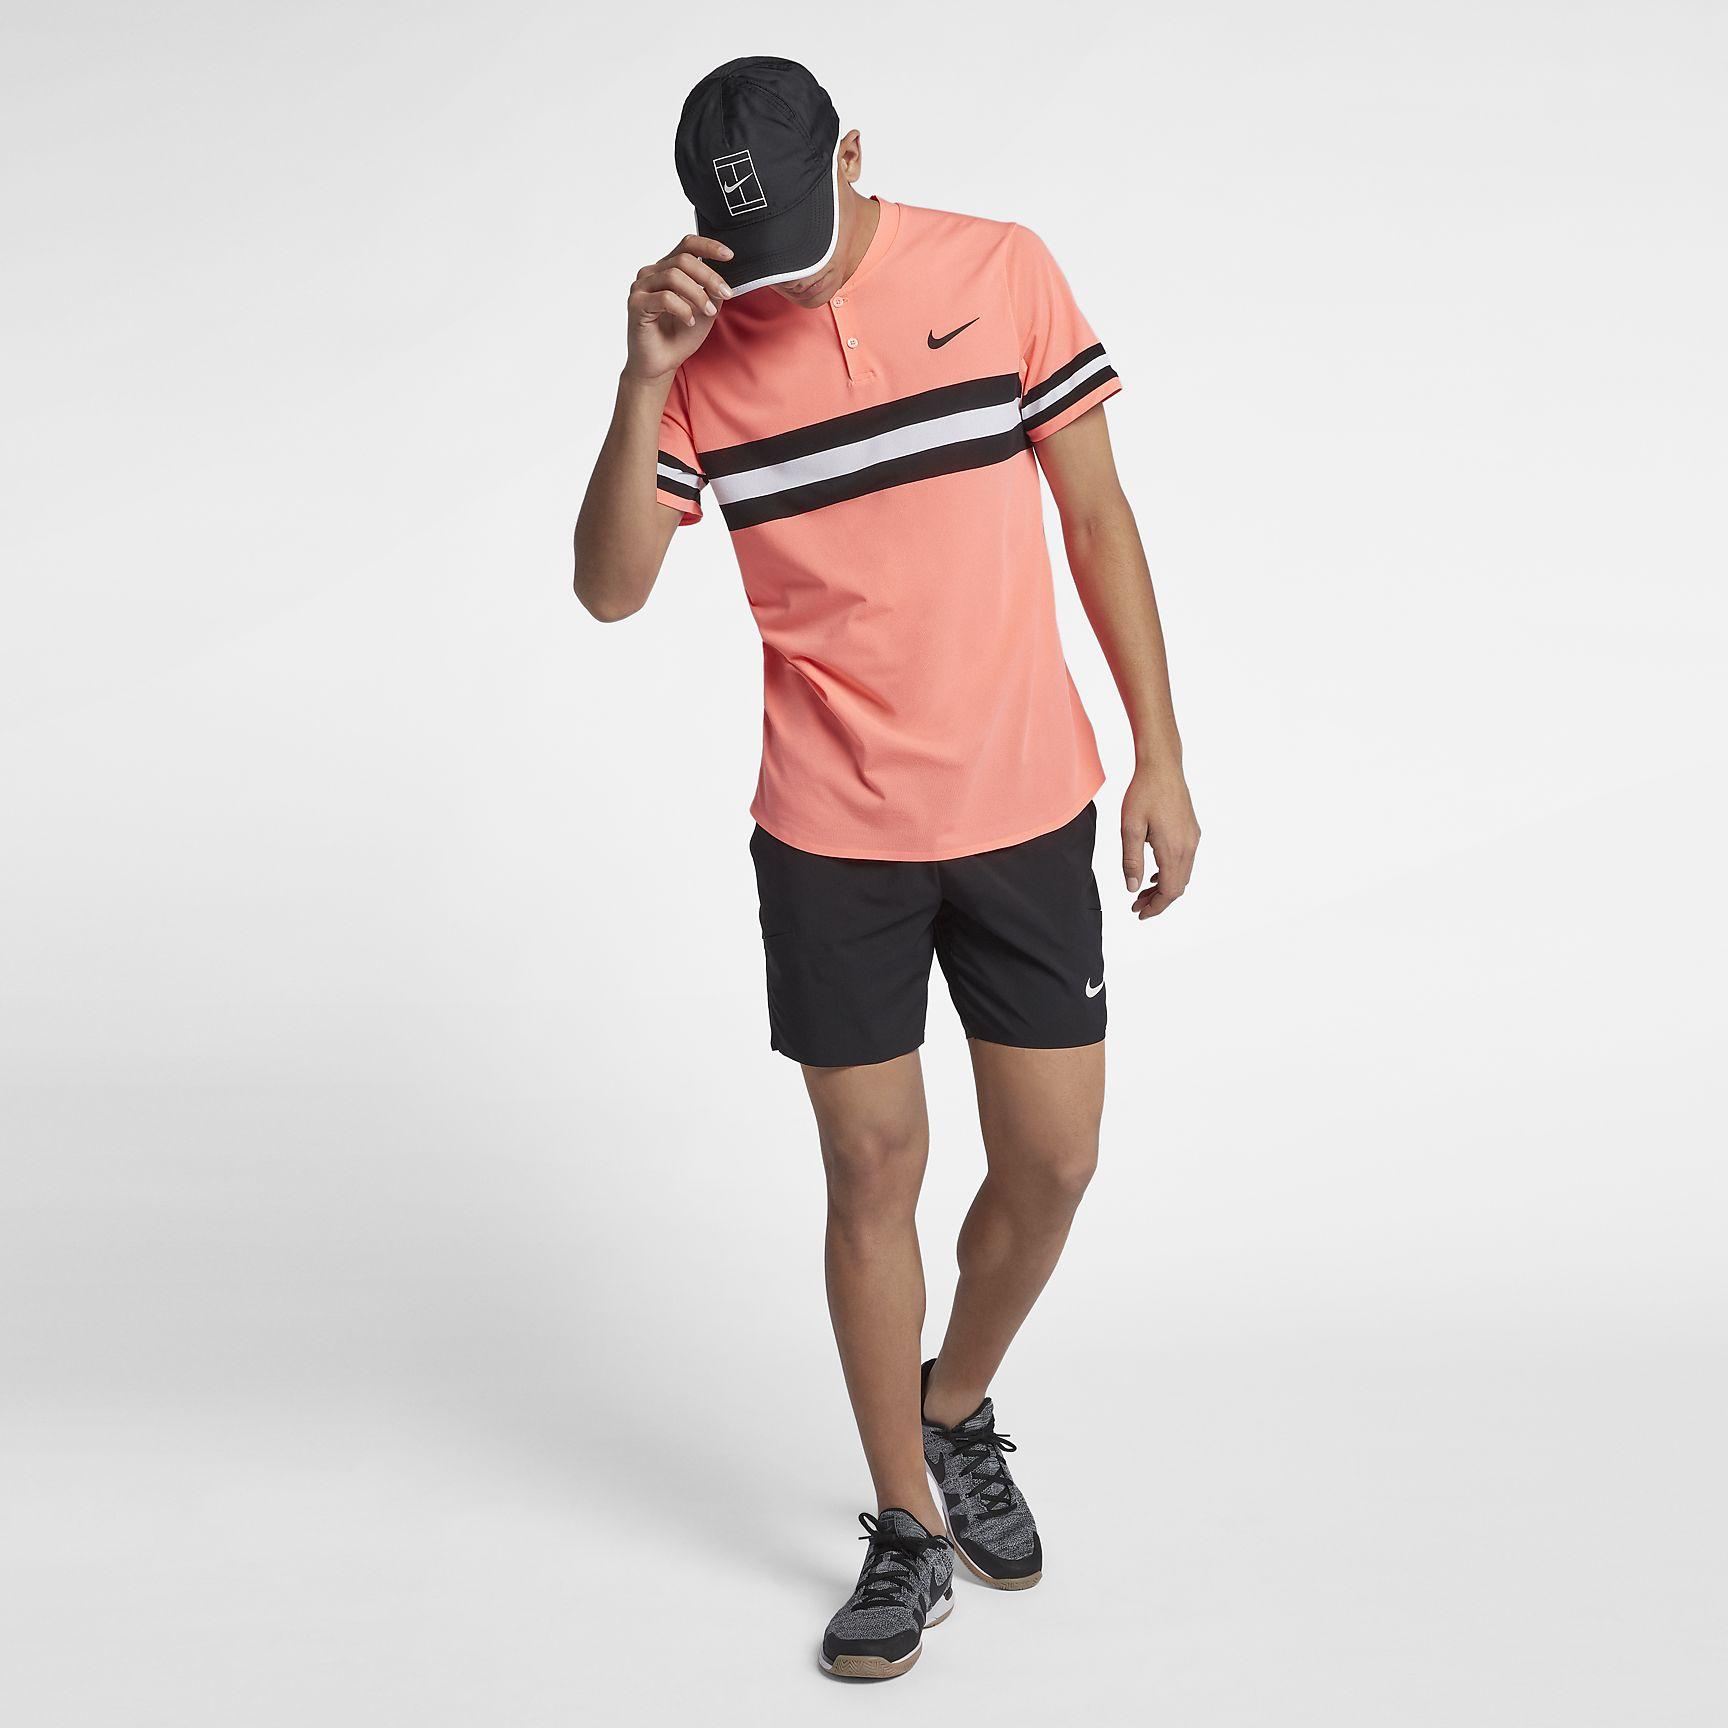 Sports Goods Tee Fit Tennis Dri Nike Court Advantage Polo Sporting zqR4ZTw